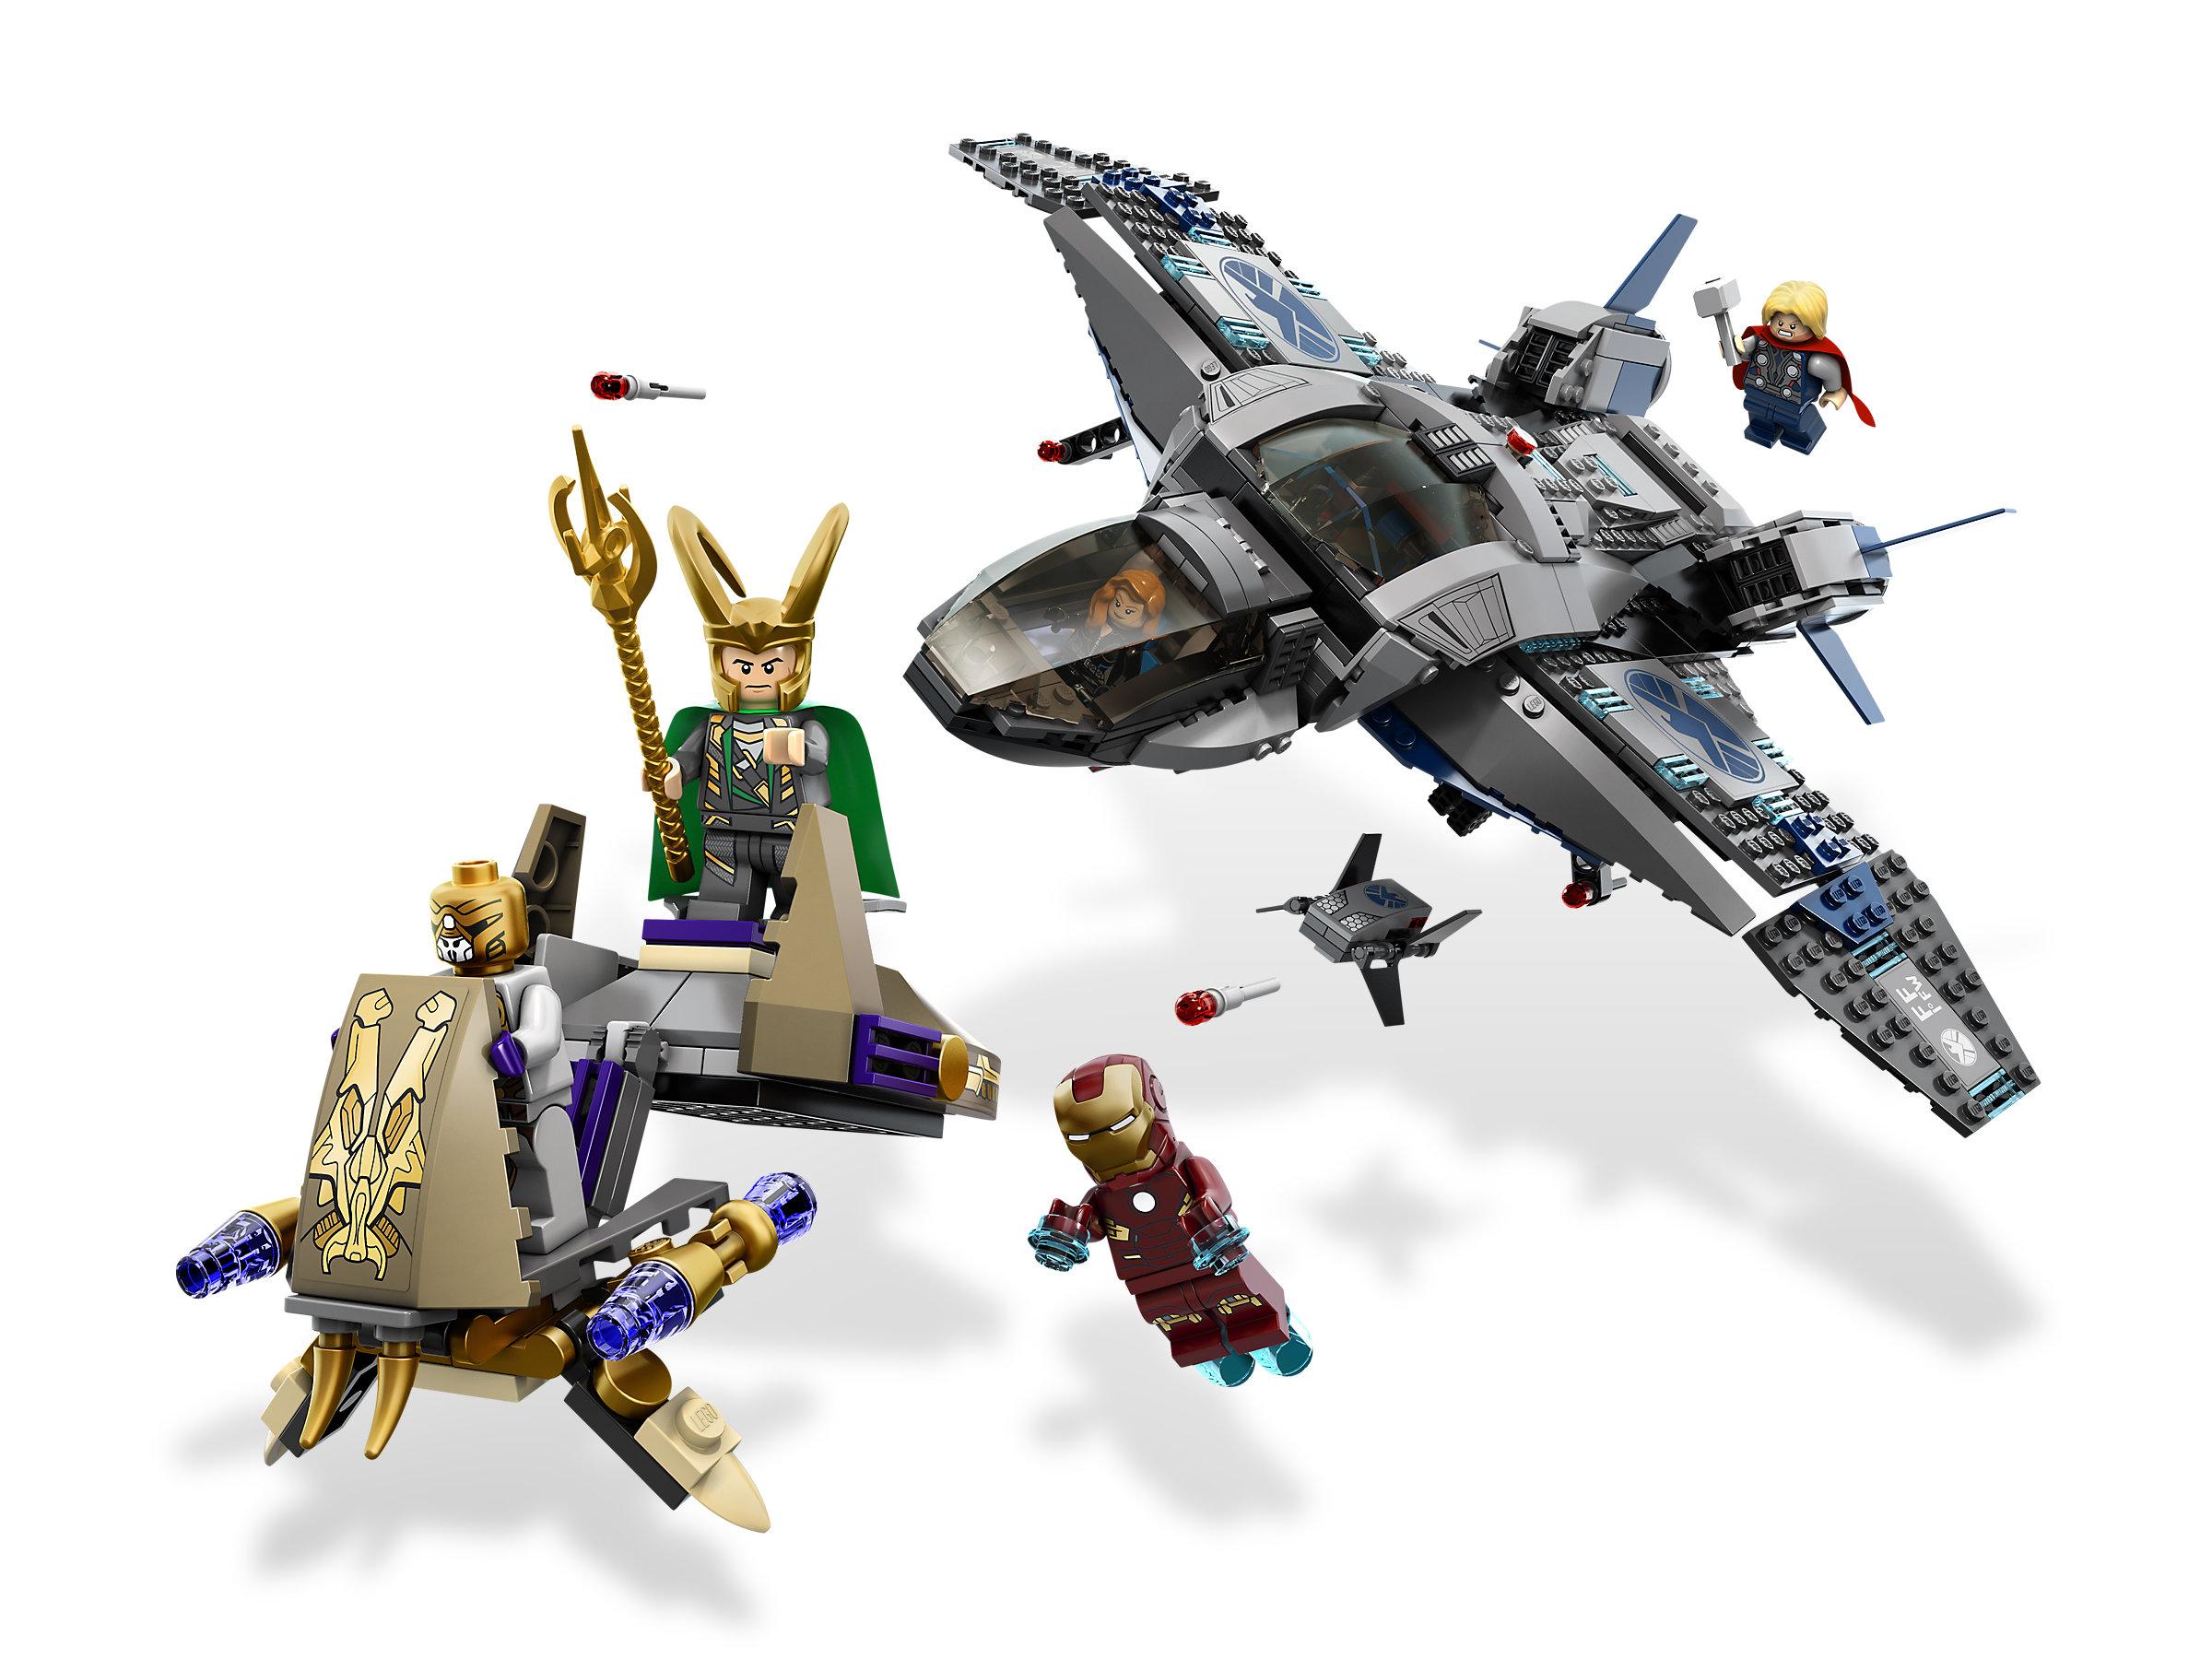 LEGO 6869 MARVEL SUPER HEROES AVENGERS QUINJET AERIAL BATTLE NIB